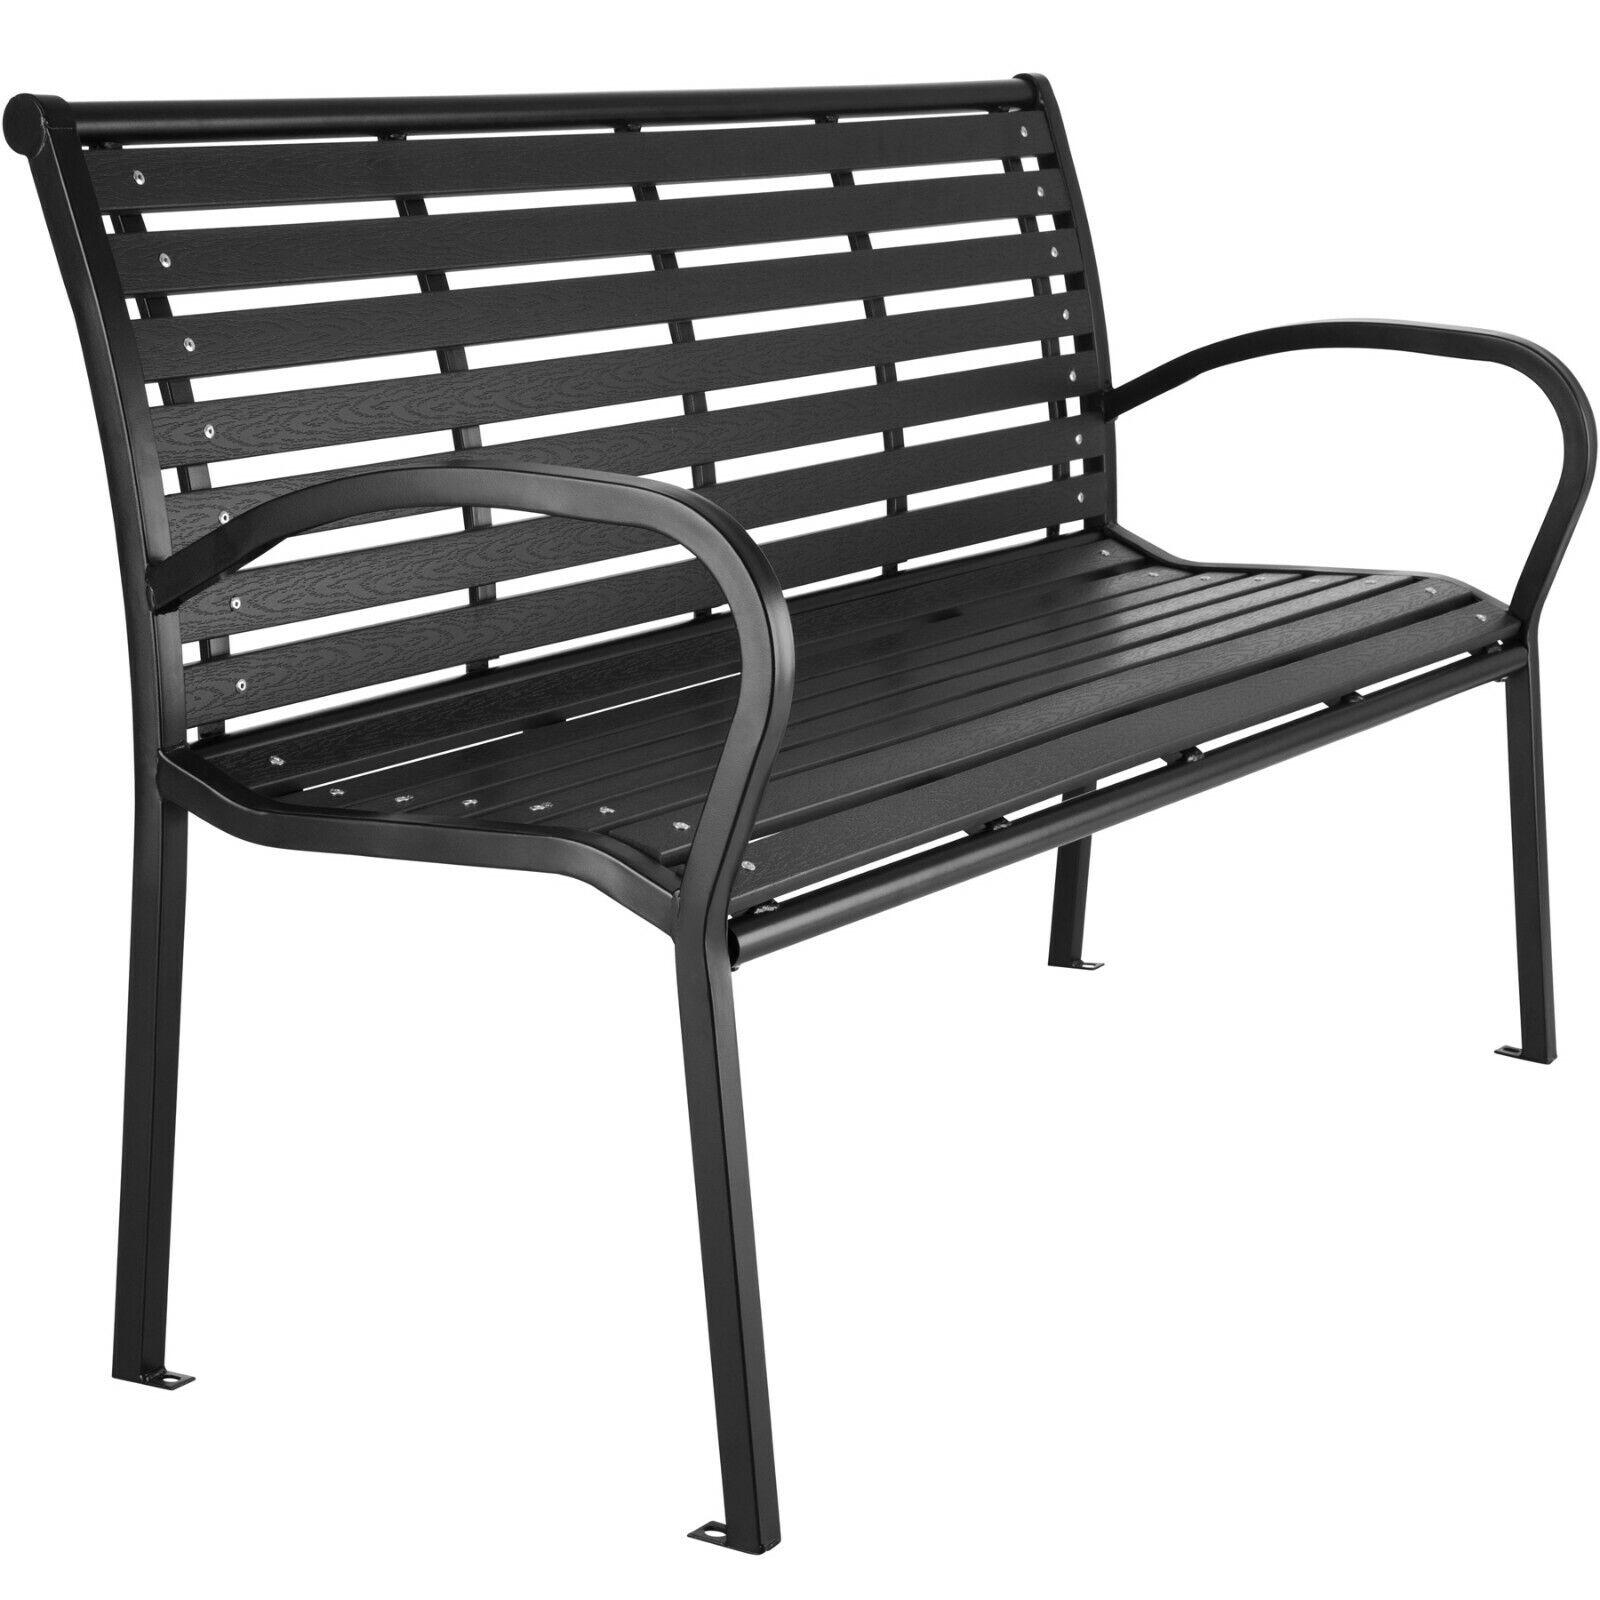 Gartenbank 3-Sitzer Sitzbank Parkbank WPC Metall Bank Balkon Gartenmöbel schwarz